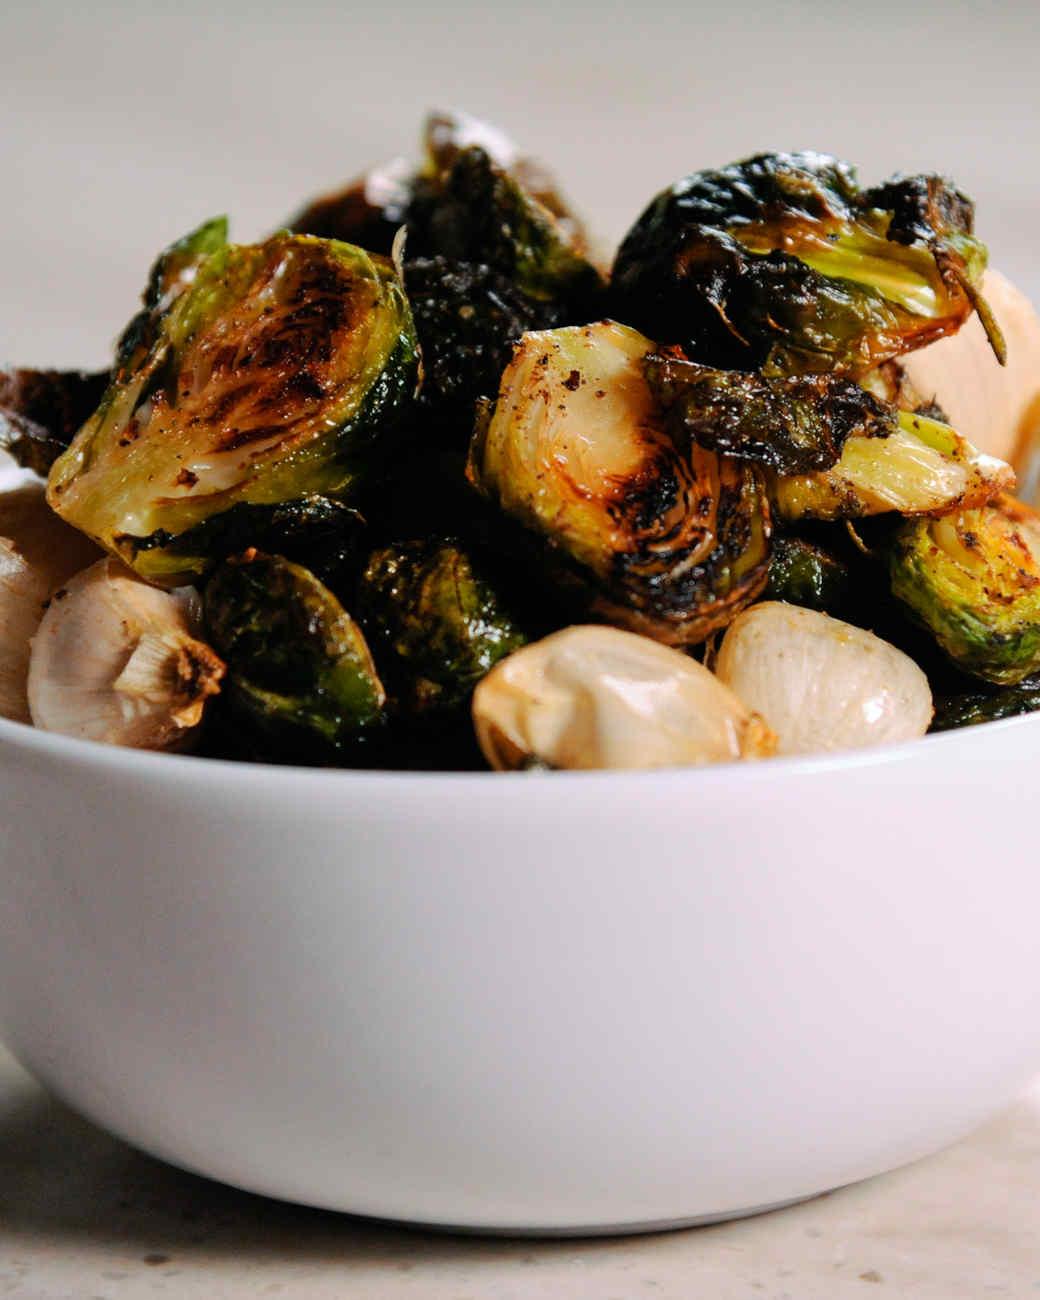 roasted-brussels-sprouts-mscs109.jpg